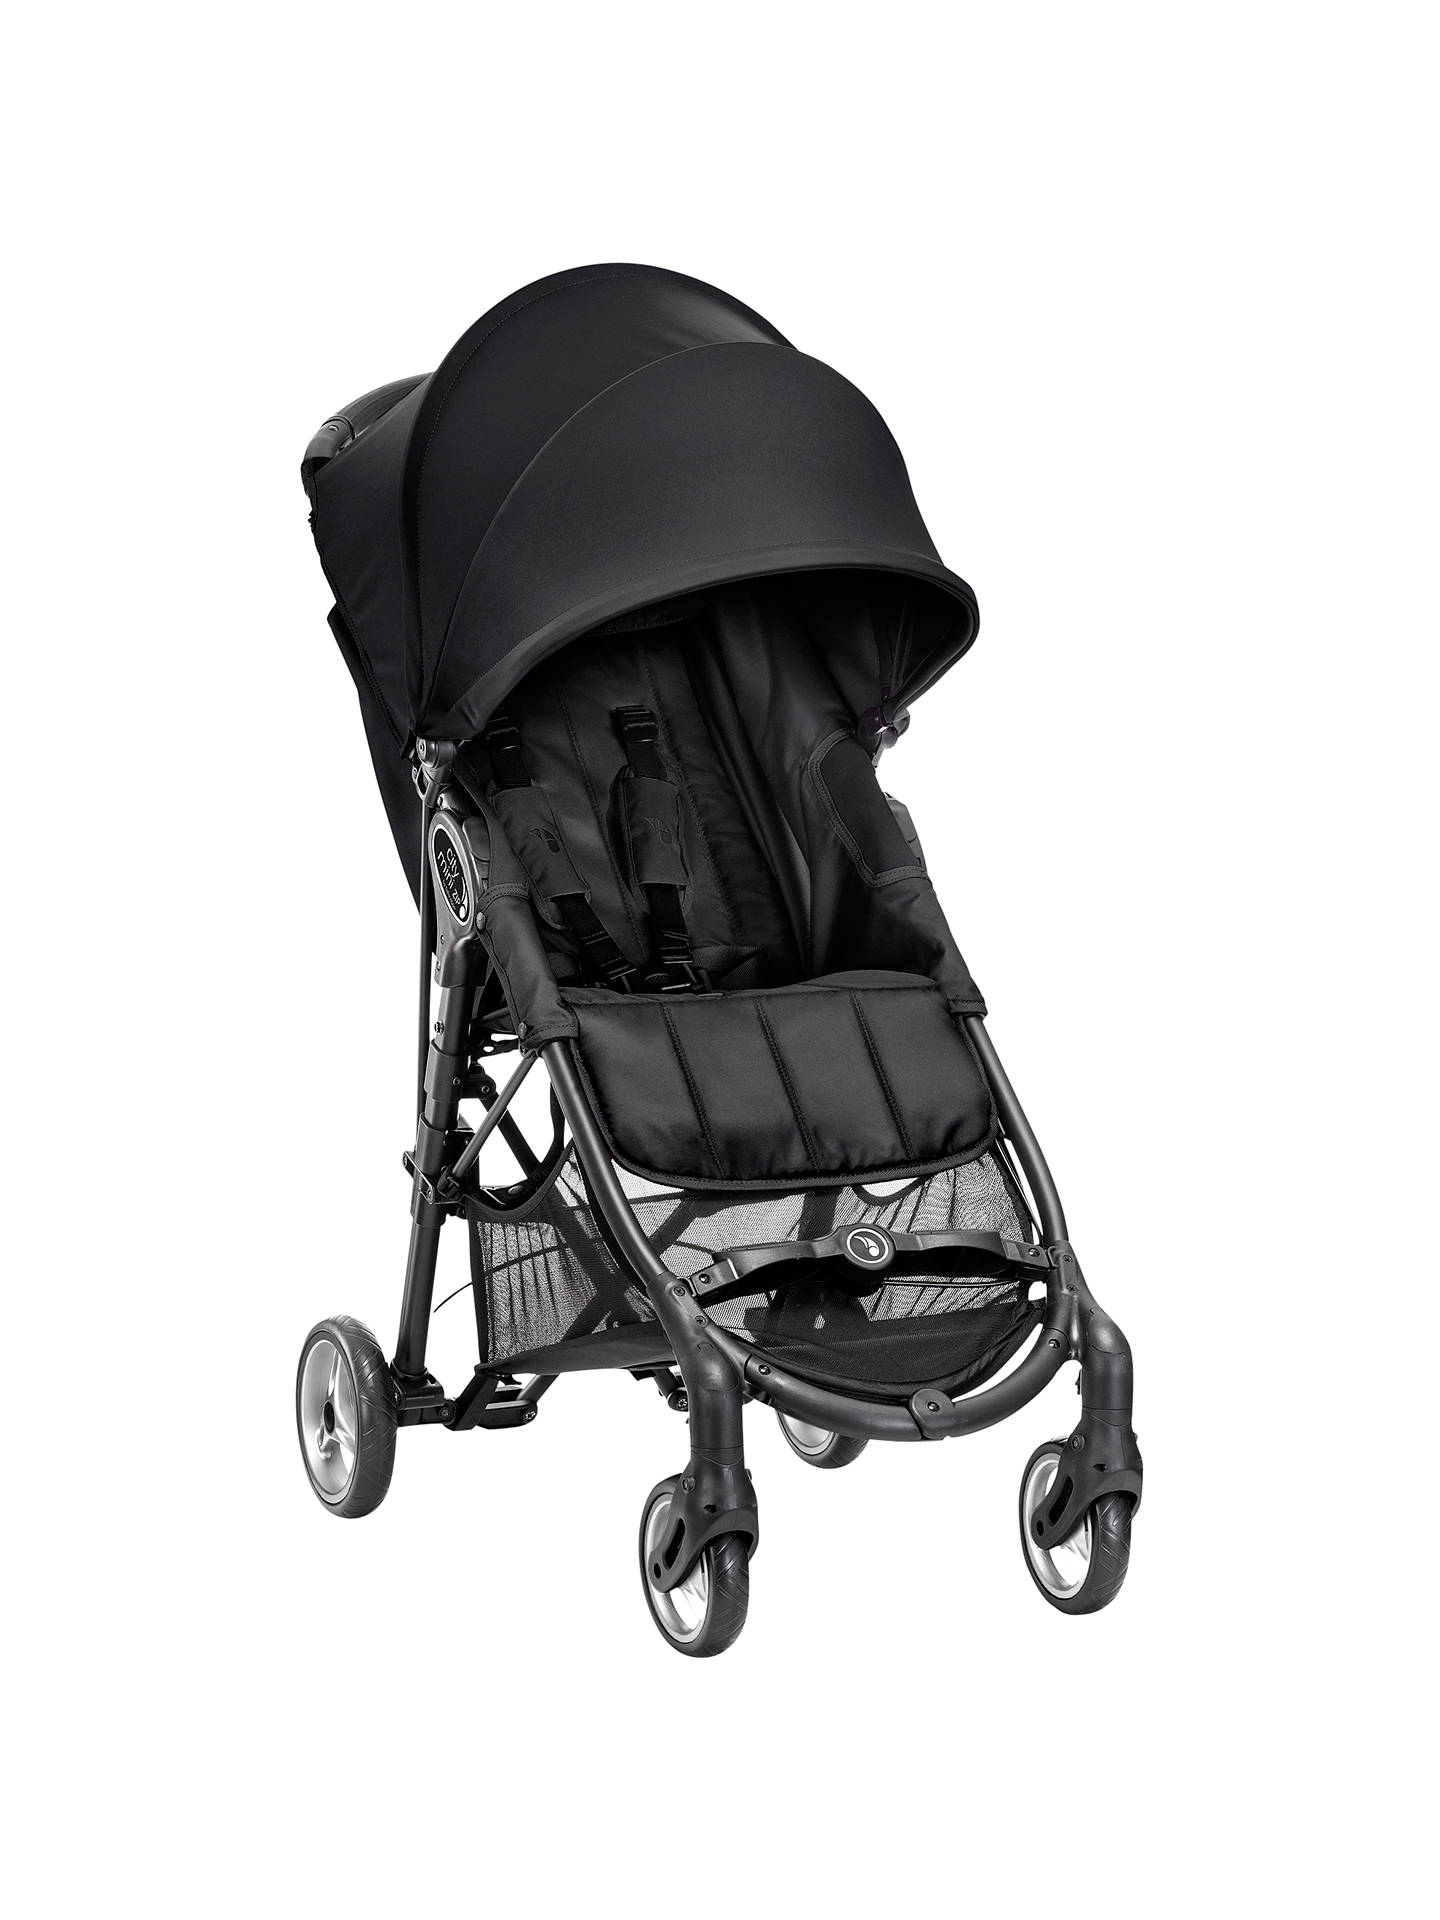 7e87c048c02 Buy Baby Jogger City Mini ZIP® Pushchair